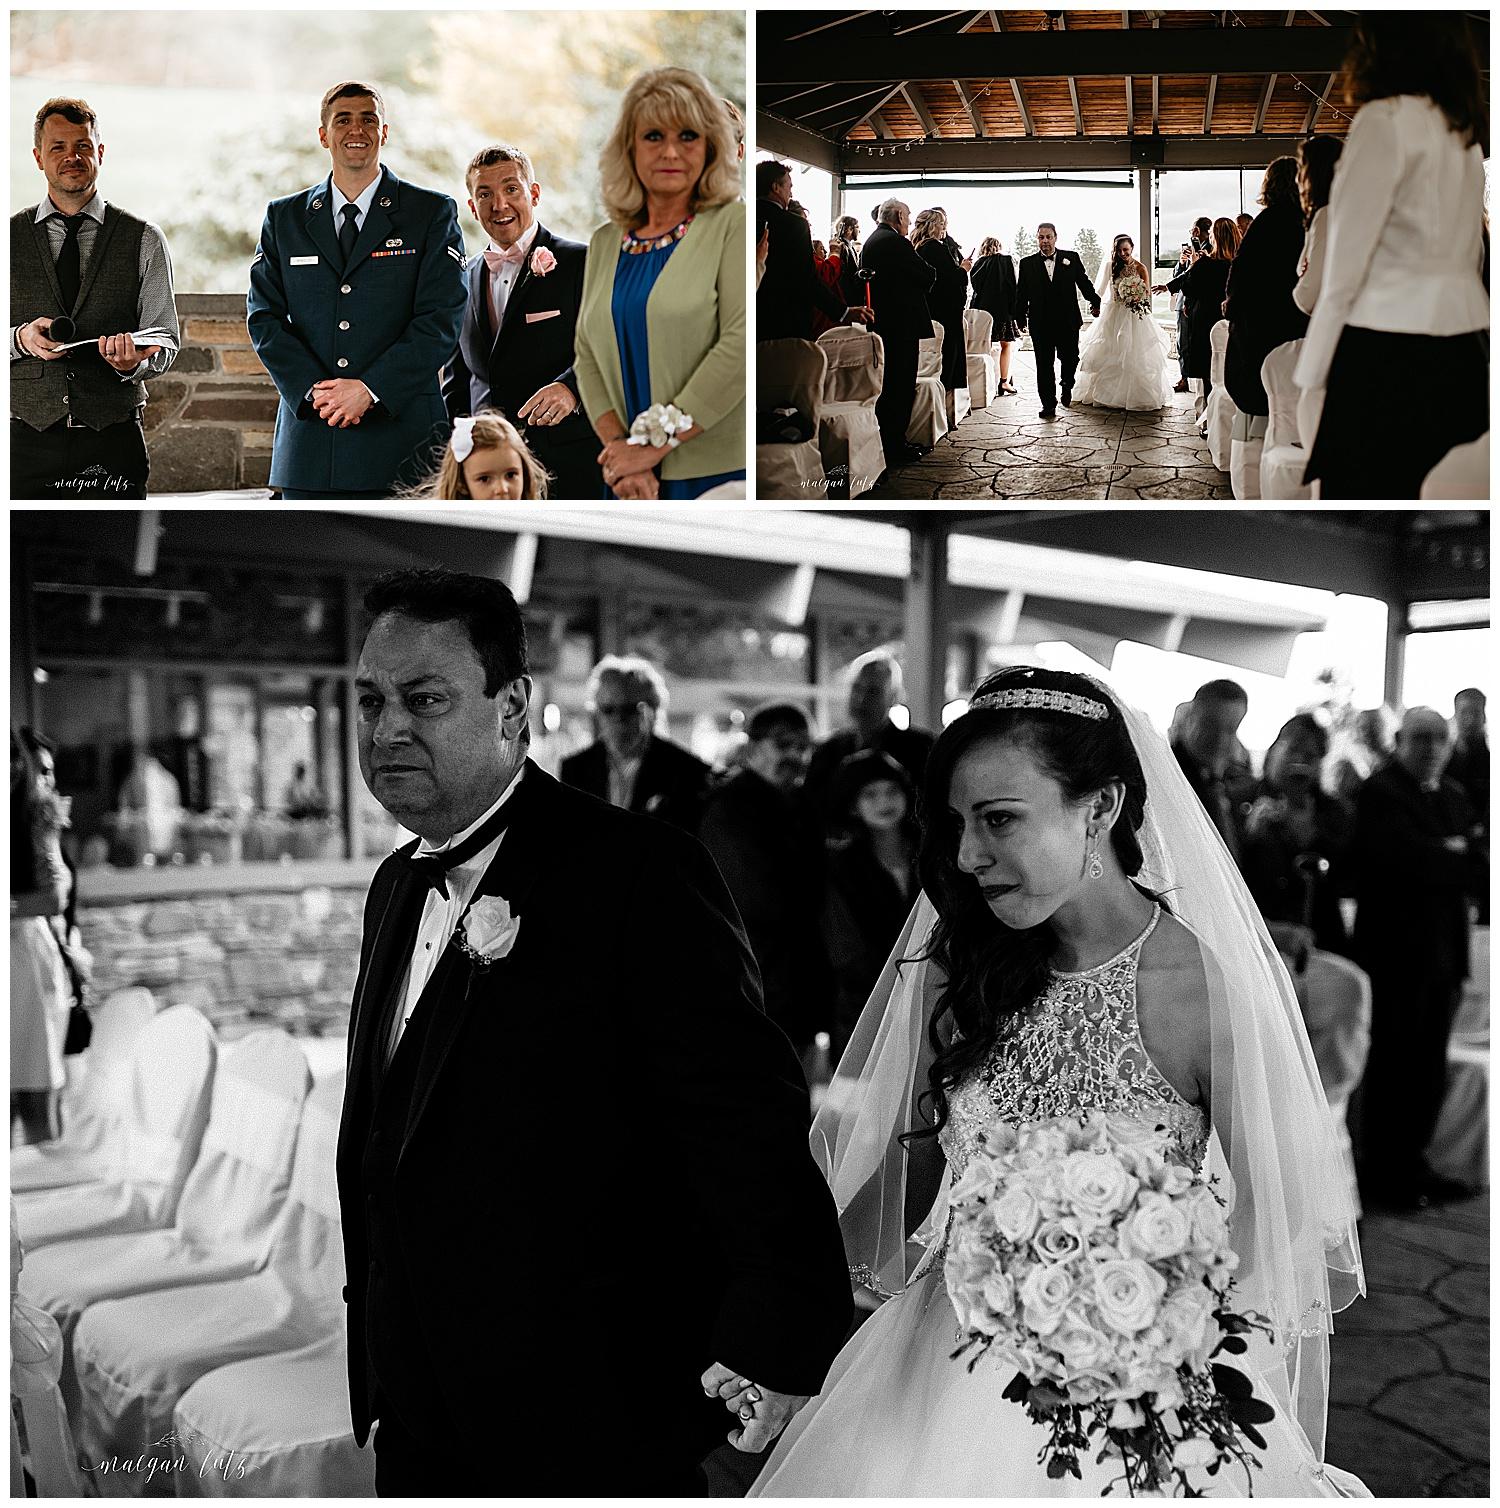 NEPA-Lehigh-Valley-Wedding-Photographer-at-Glen-Oak-Country-Club-Clarks-Summit-PA_0041.jpg